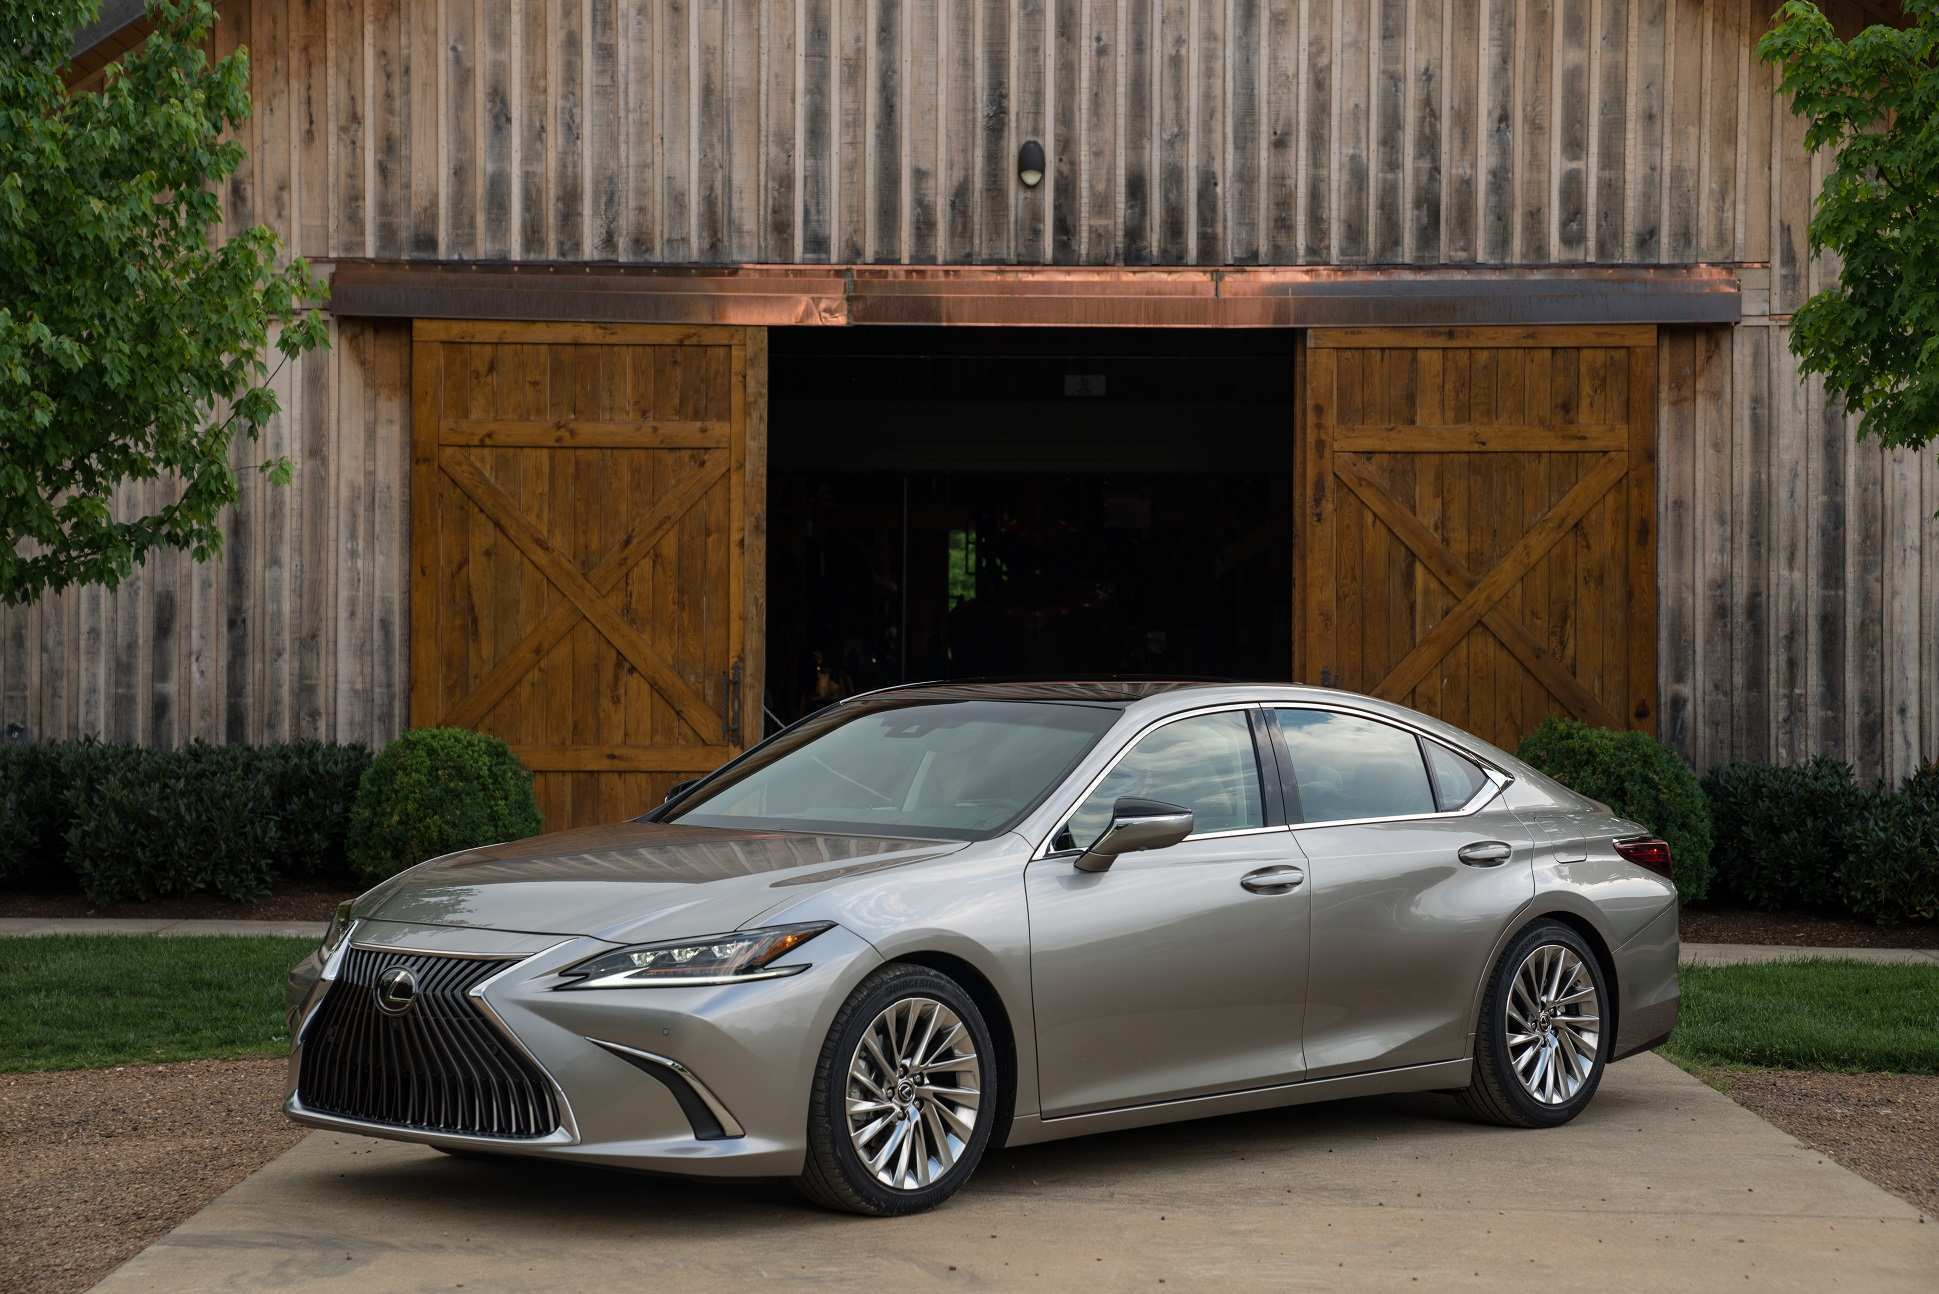 75 All New New Lexus Future Cars 2019 Performance Speed Test by New Lexus Future Cars 2019 Performance